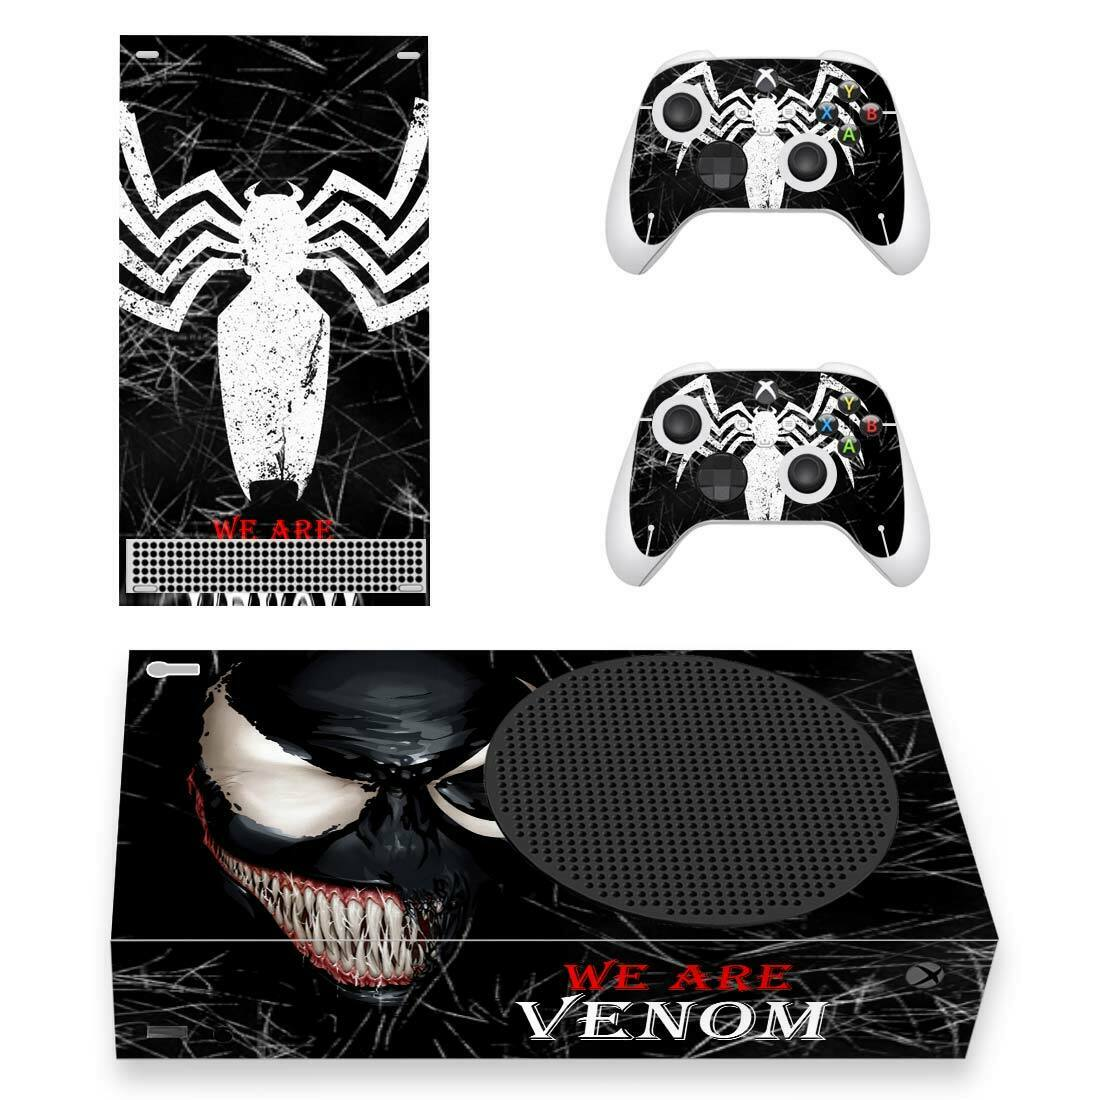 Venom Vinyl Design Skin Decal Sticker for Xbox Series S Console & 2 Controllers